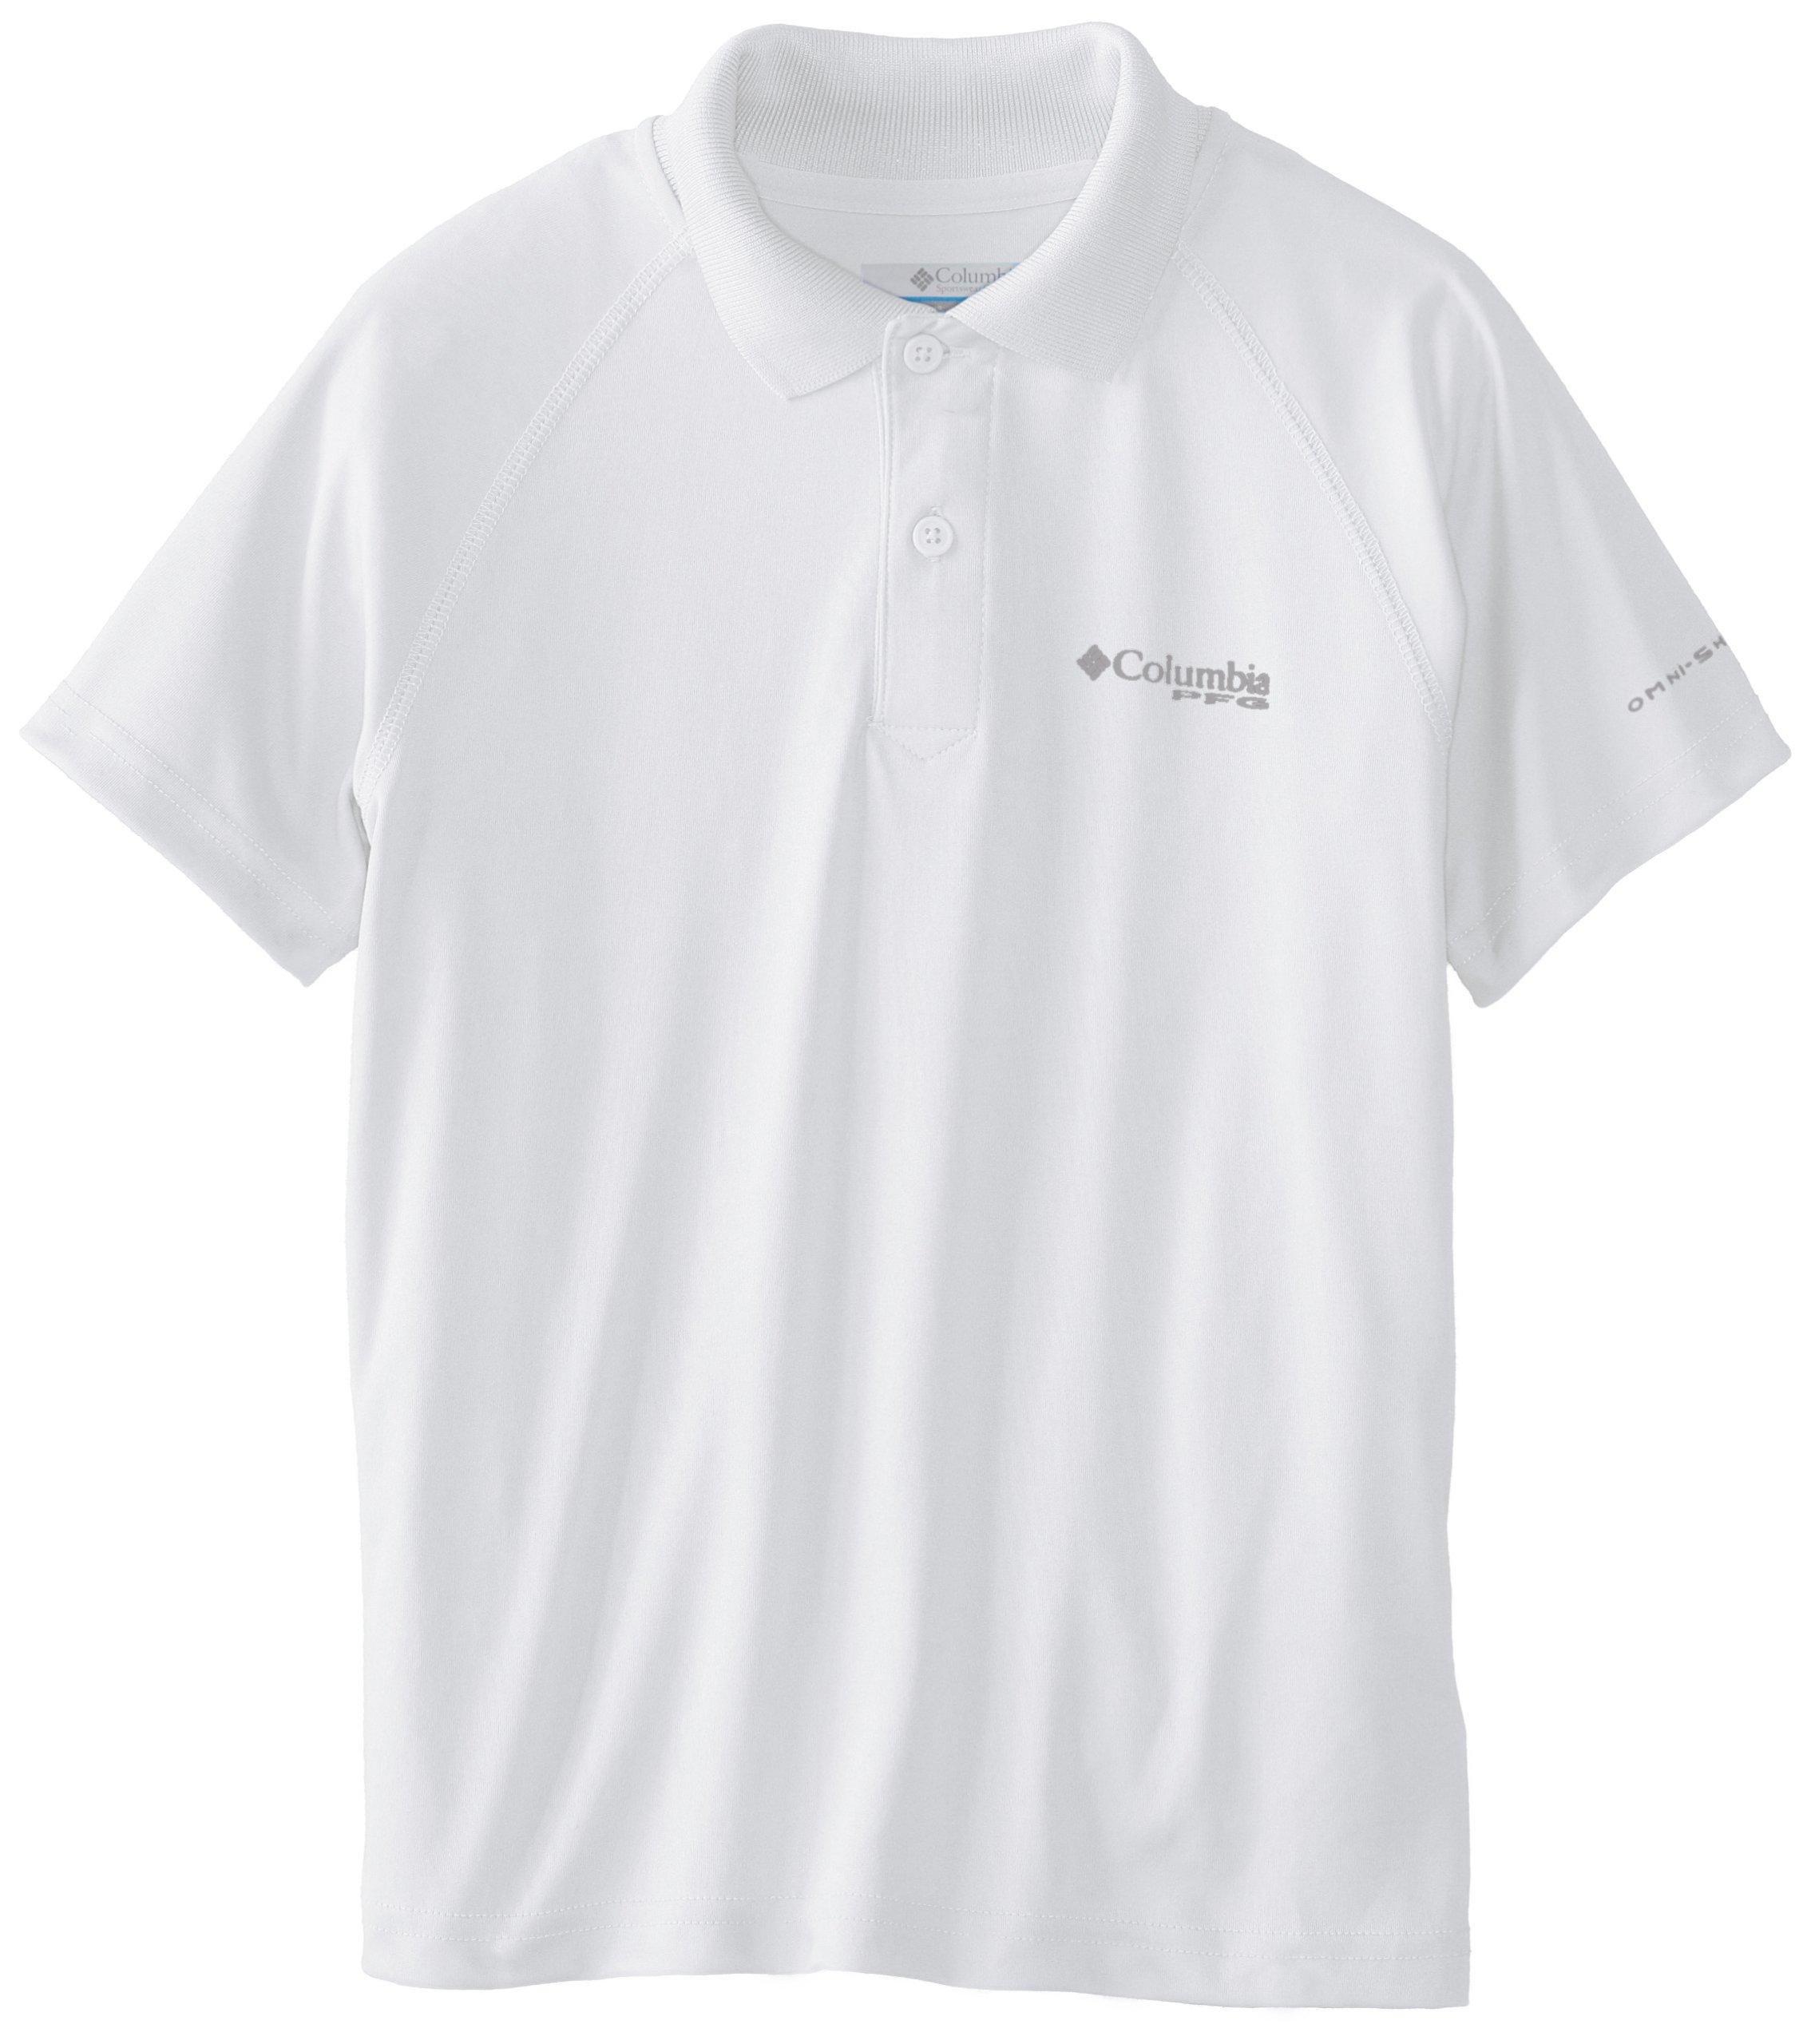 Columbia Sportswear Boy's Terminal Tackle Polo Shirt (Youth), White, Medium